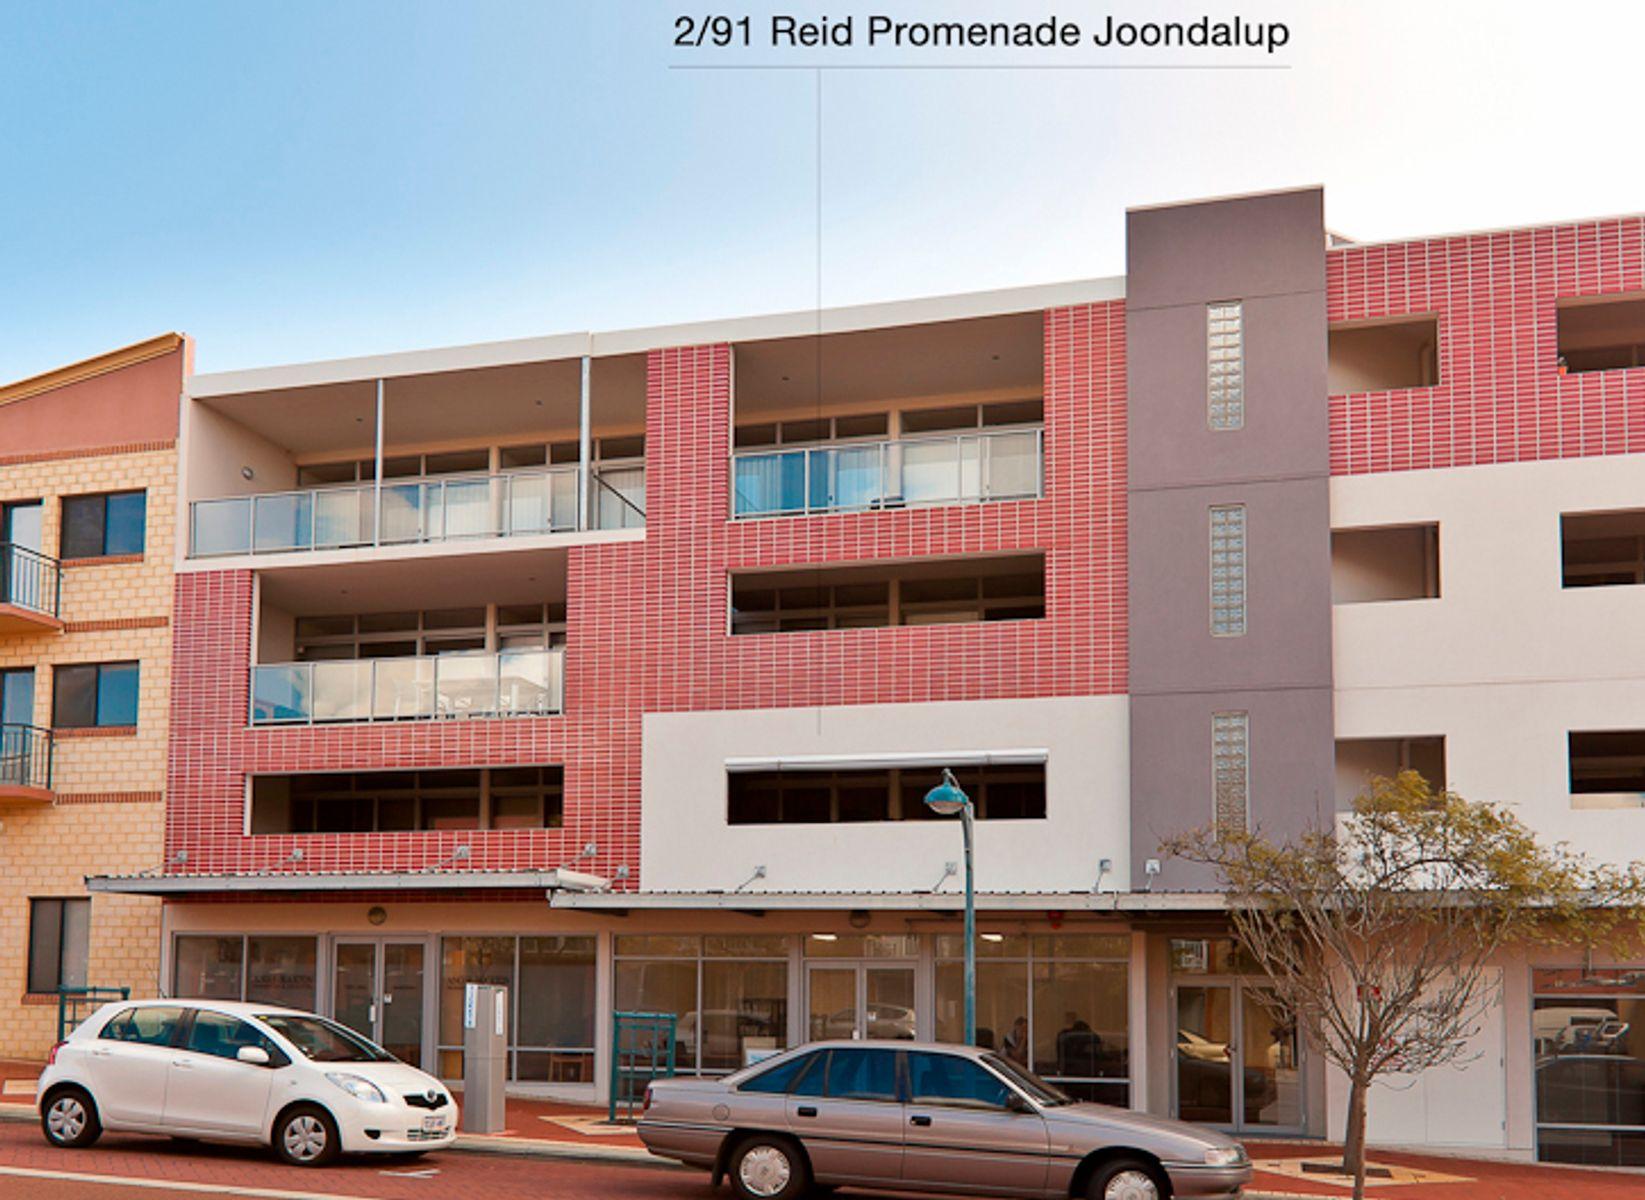 2/91 Reid Promenade, Joondalup, WA 6027